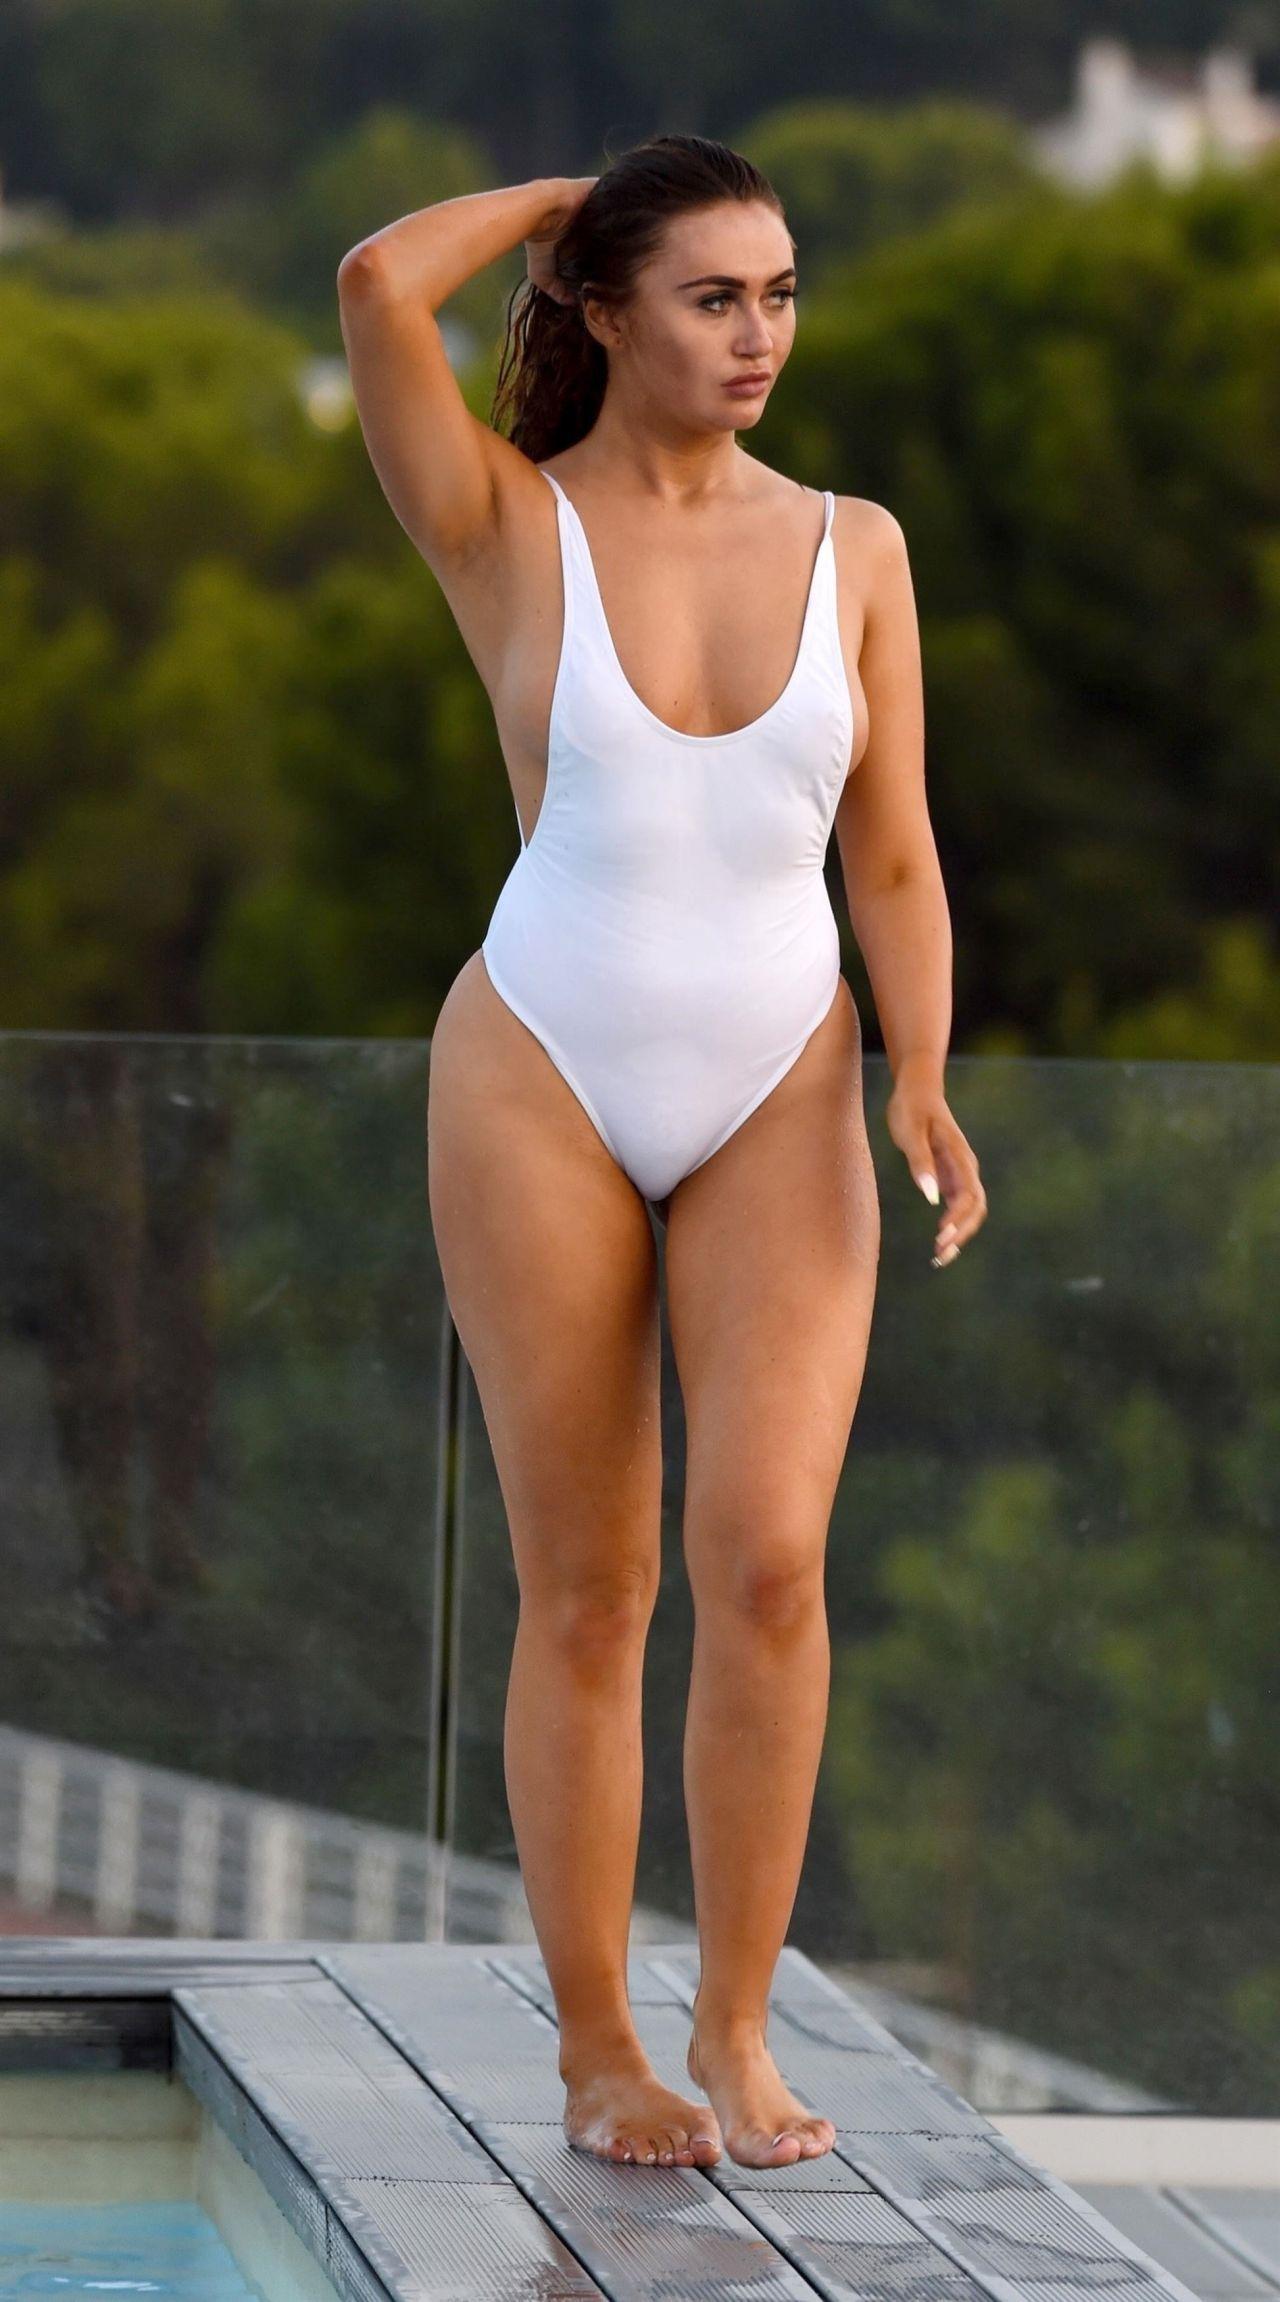 Booty Charlotte Dawson nude photos 2019